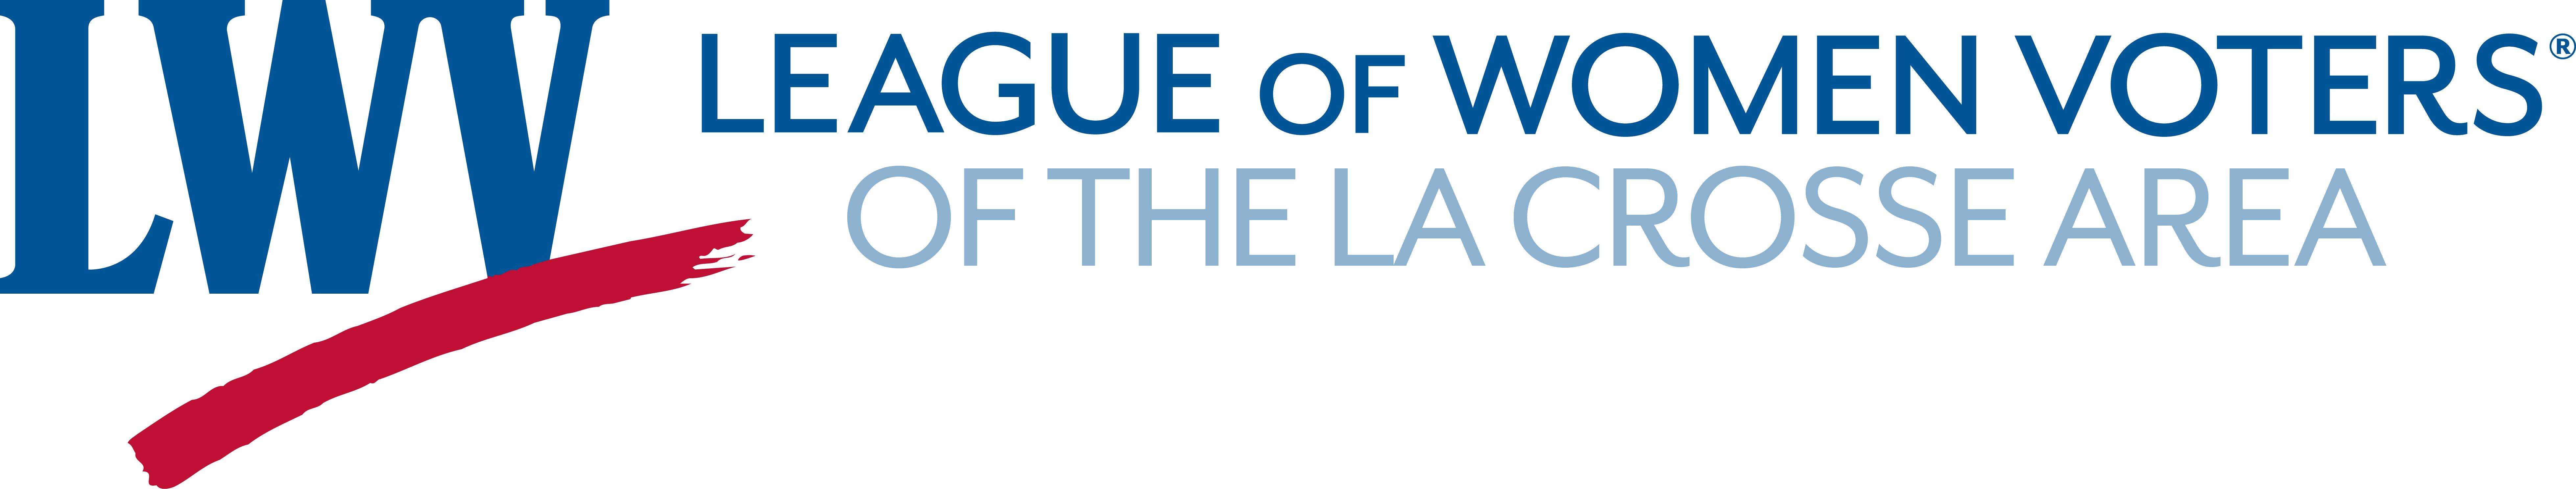 new lwvla logo